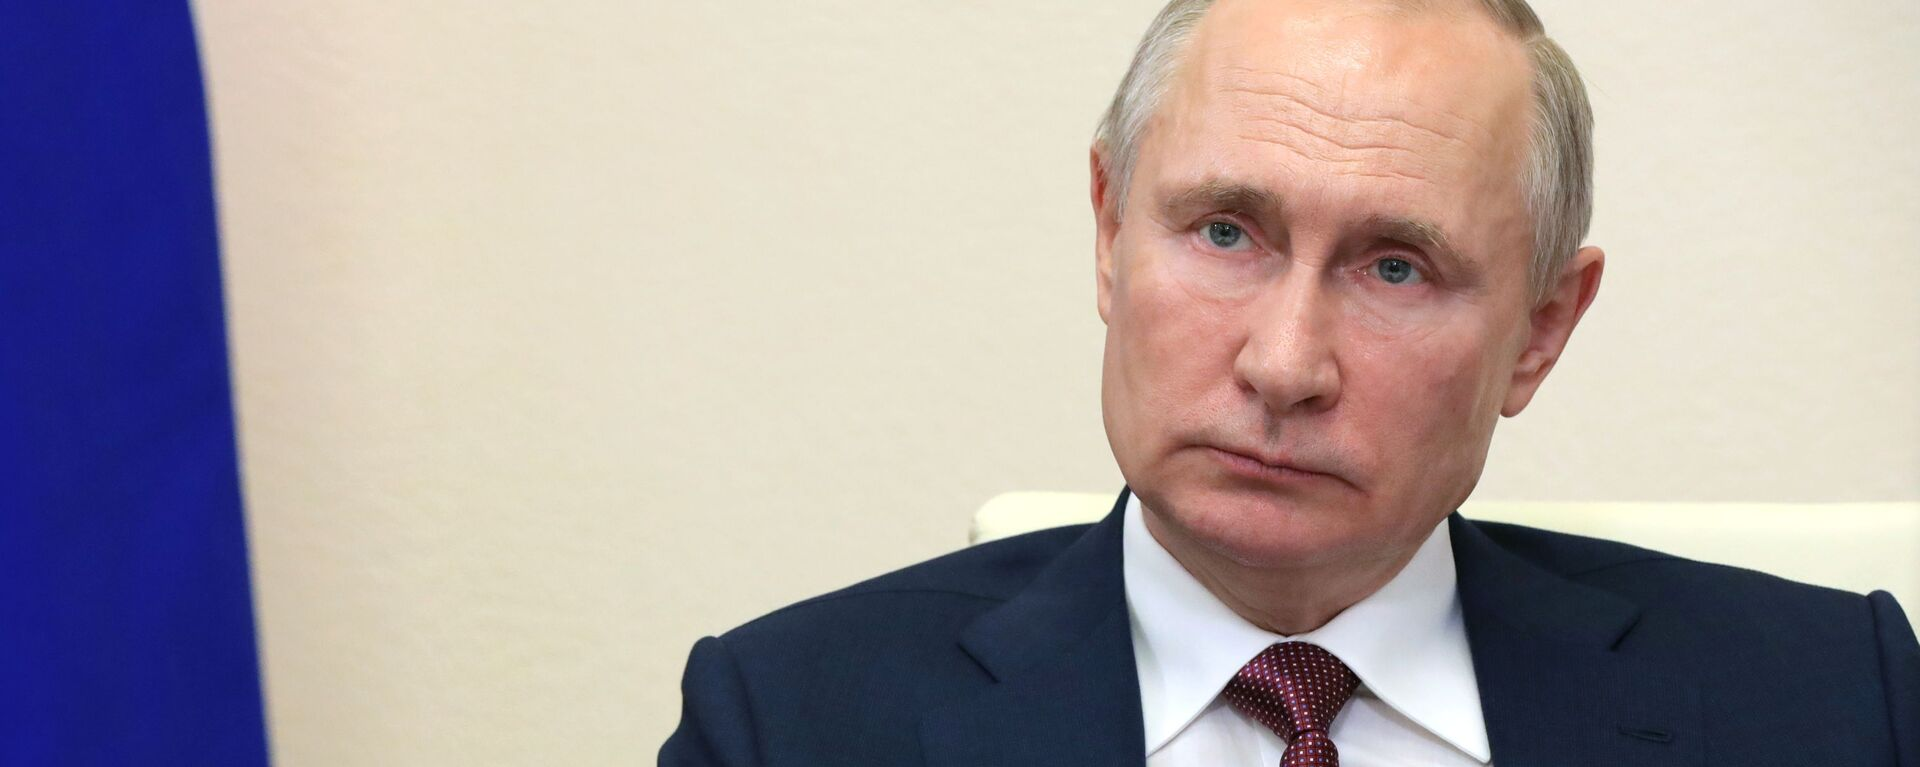 Vladímir Putin, presidente de Rusia - Sputnik Mundo, 1920, 09.04.2021